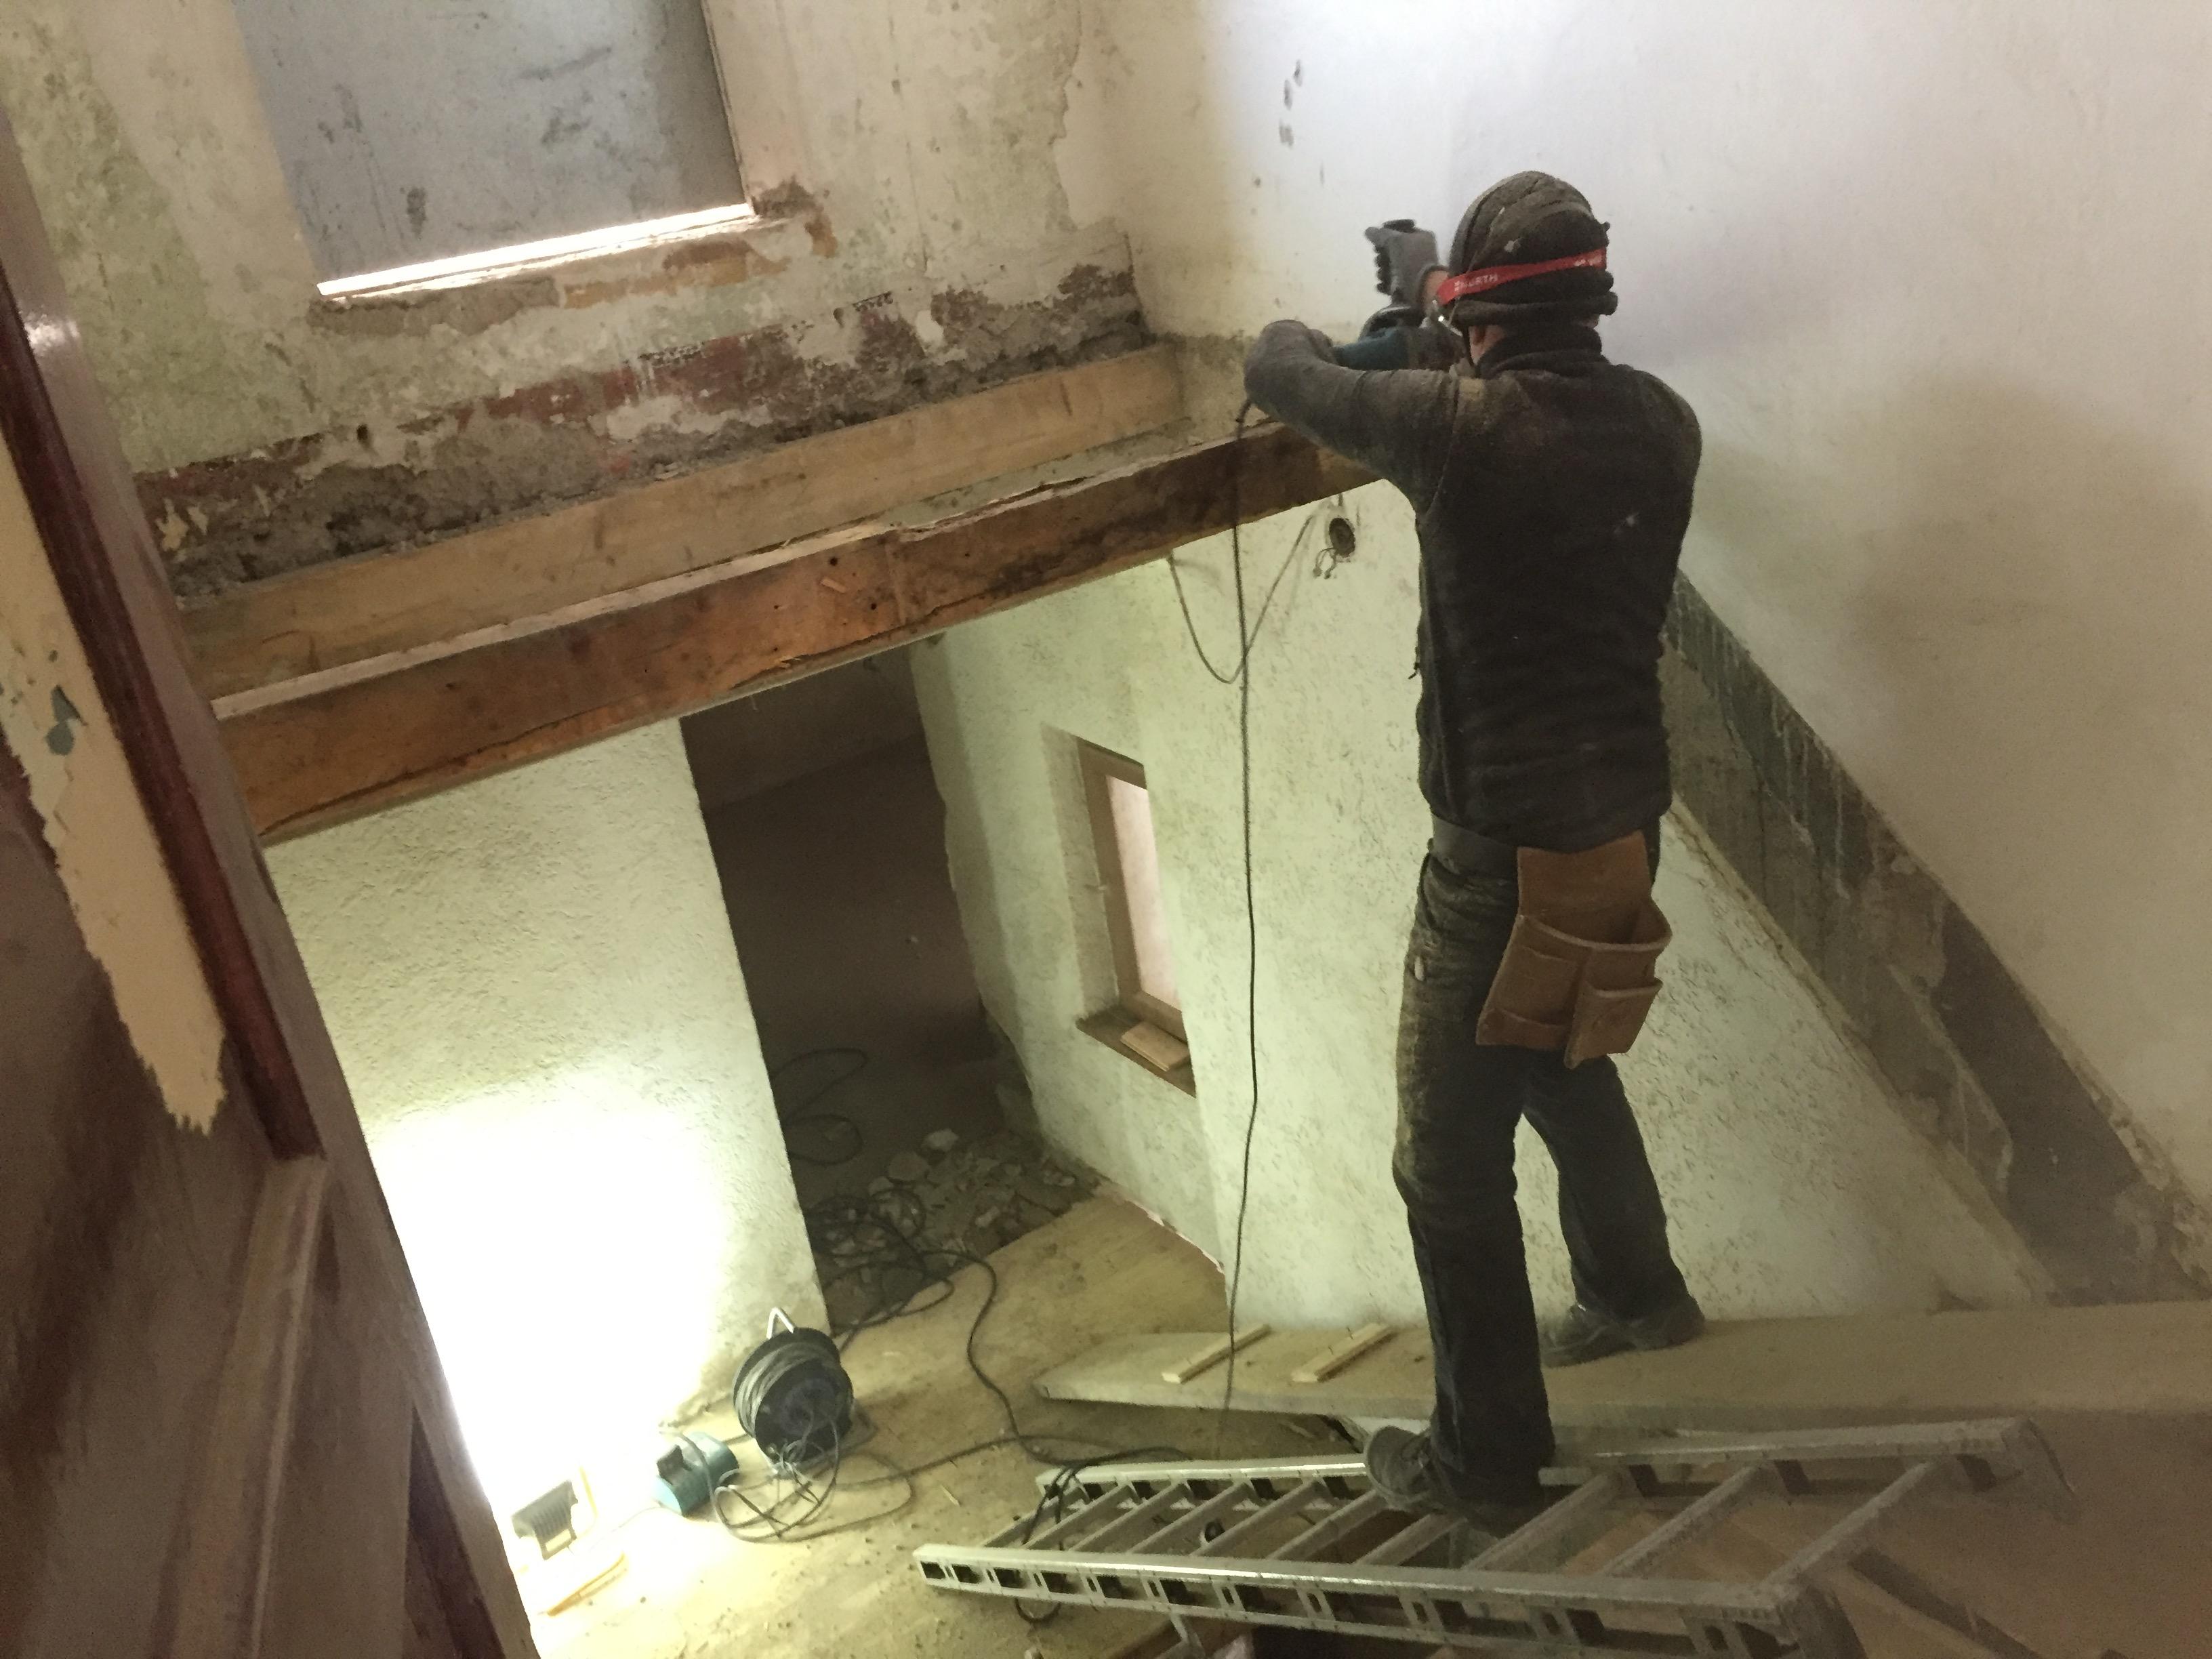 Podest-Balken werden geschrubbt